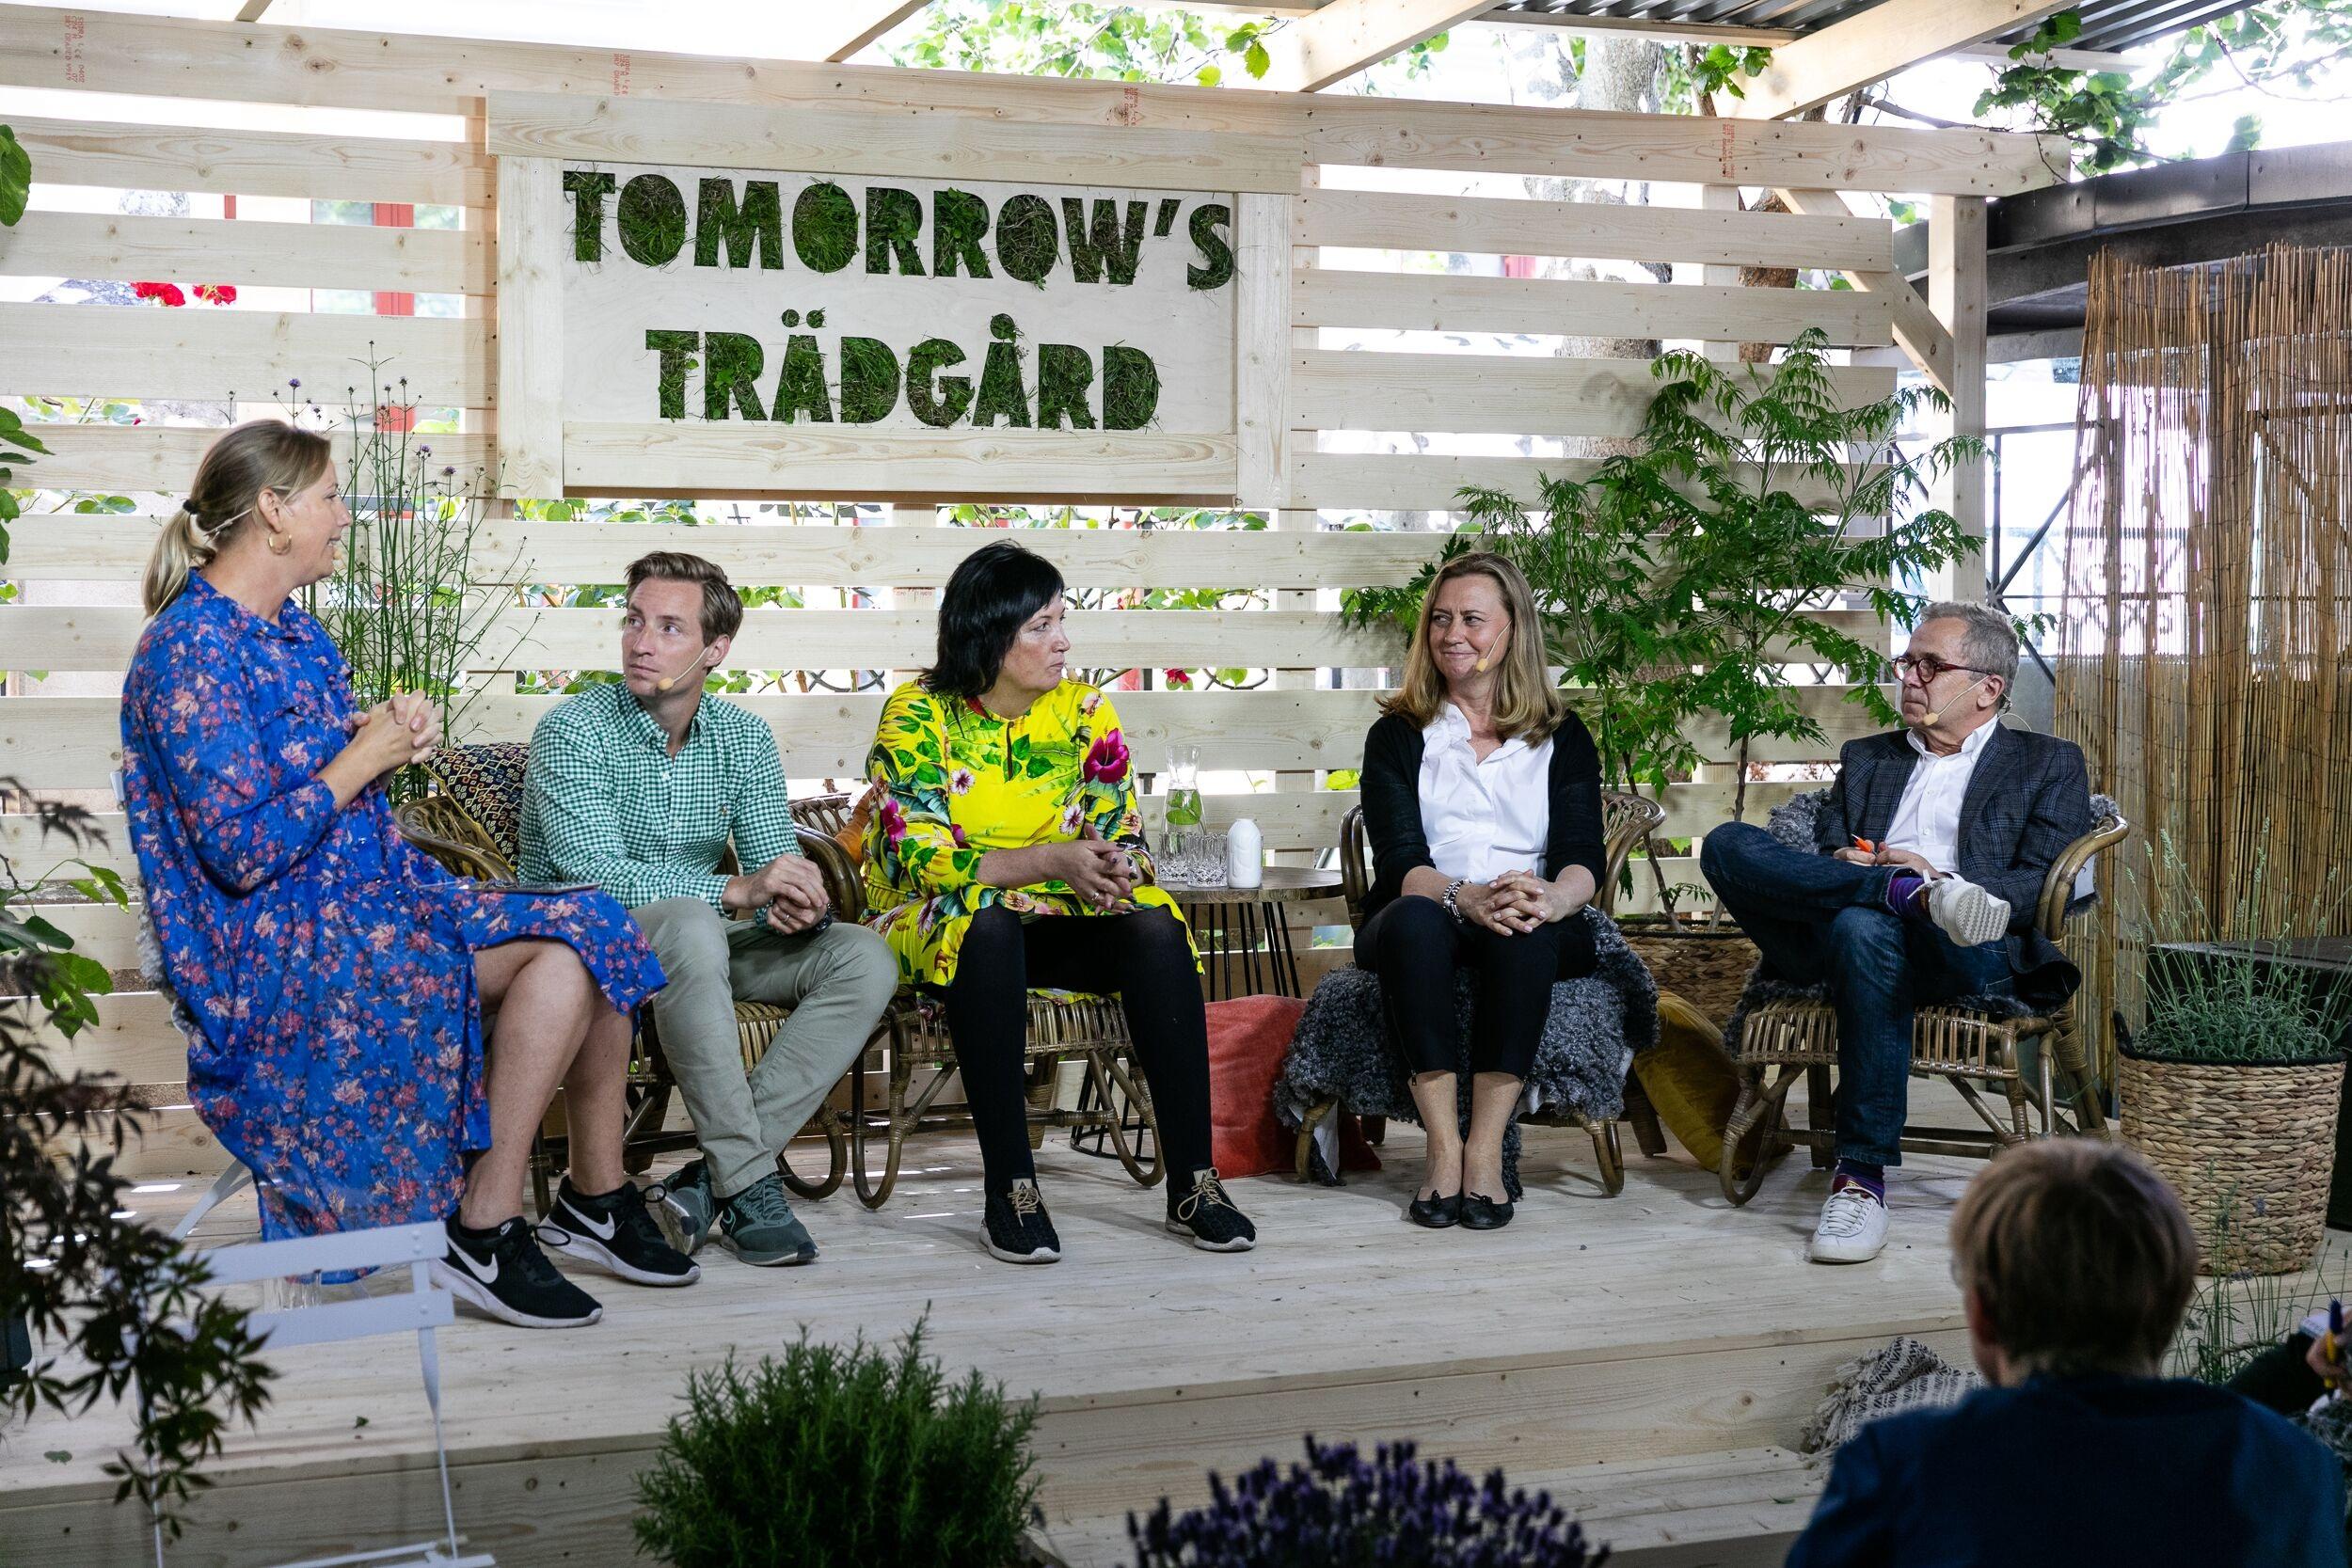 Tomorrow's Trädgård